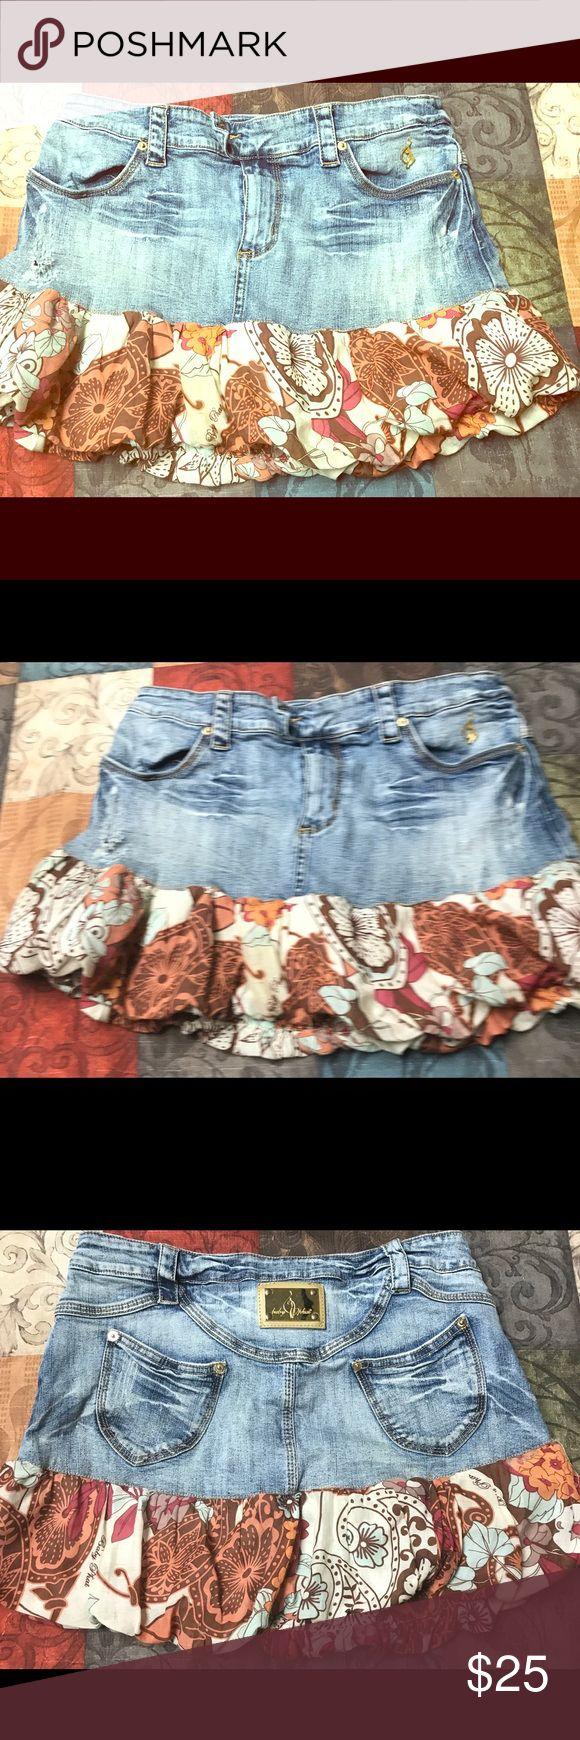 Babyphat classic stretch jean  mini skirt, size 11 BabyPhat stretch jean mini skirt, size 11 Baby Phat Skirts Mini